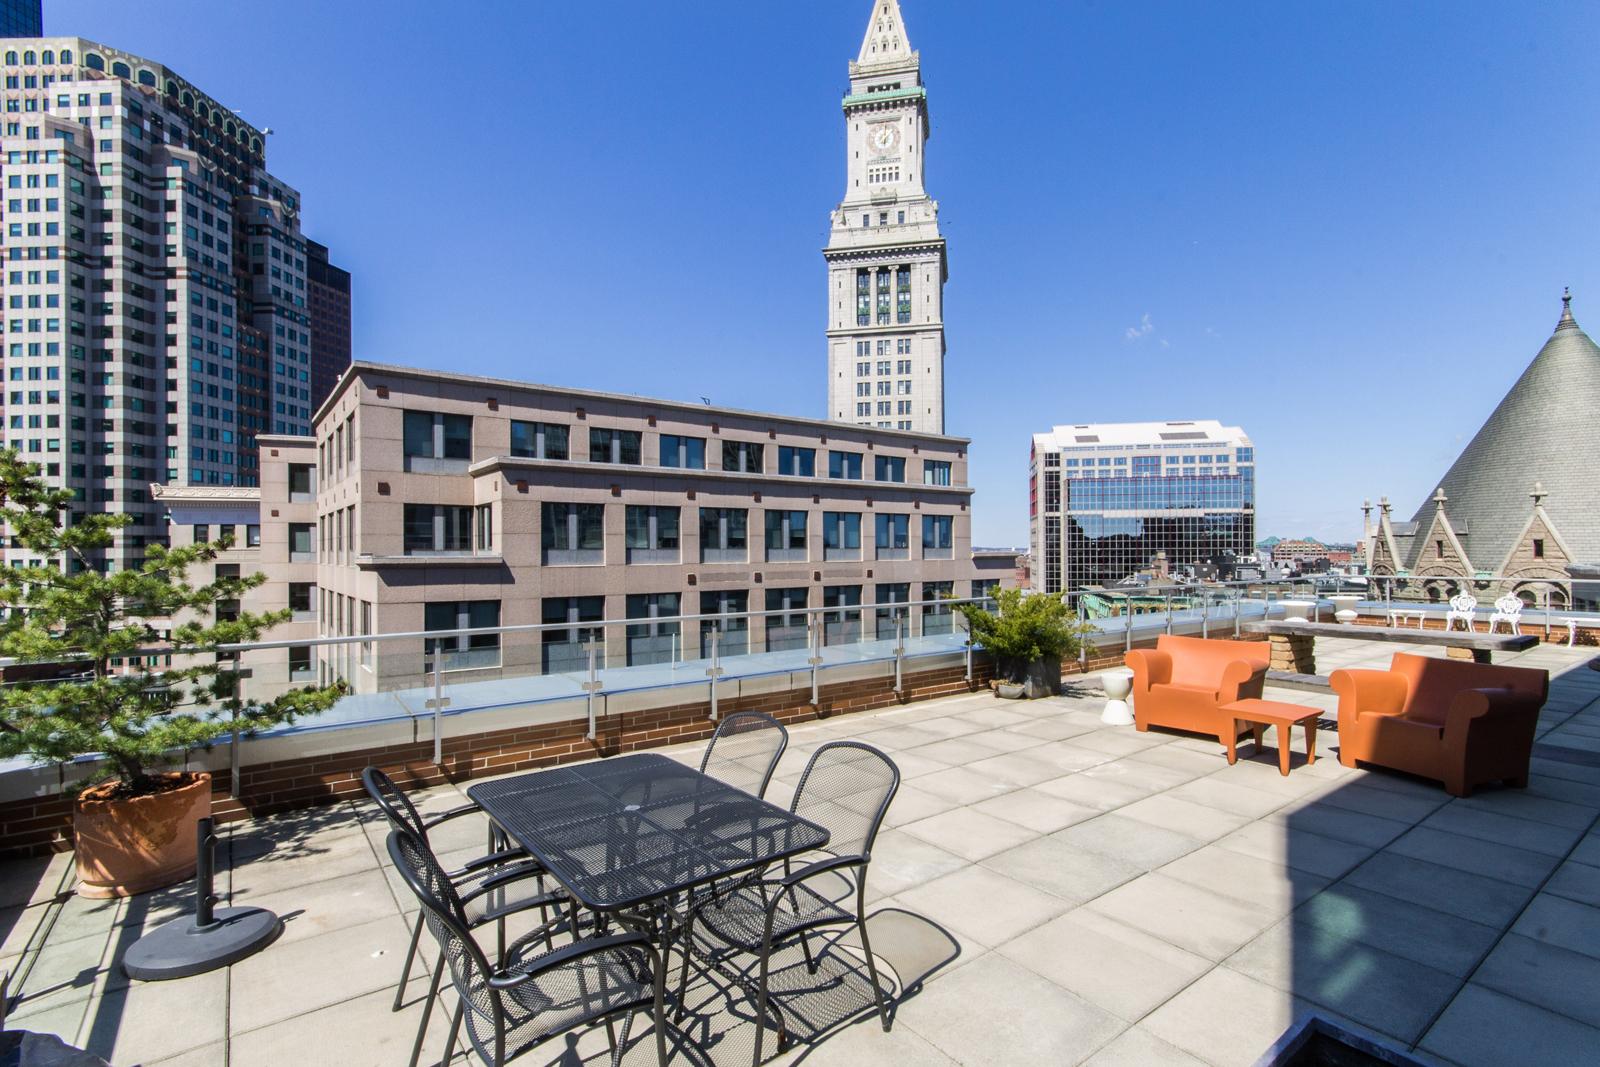 Кооперативная квартира для того Продажа на Rare Offering - Duplex Penthouse At The Folio 80 Broad Street Unit PH1105 Waterfront, Boston, Массачусетс, 02110 Соединенные Штаты